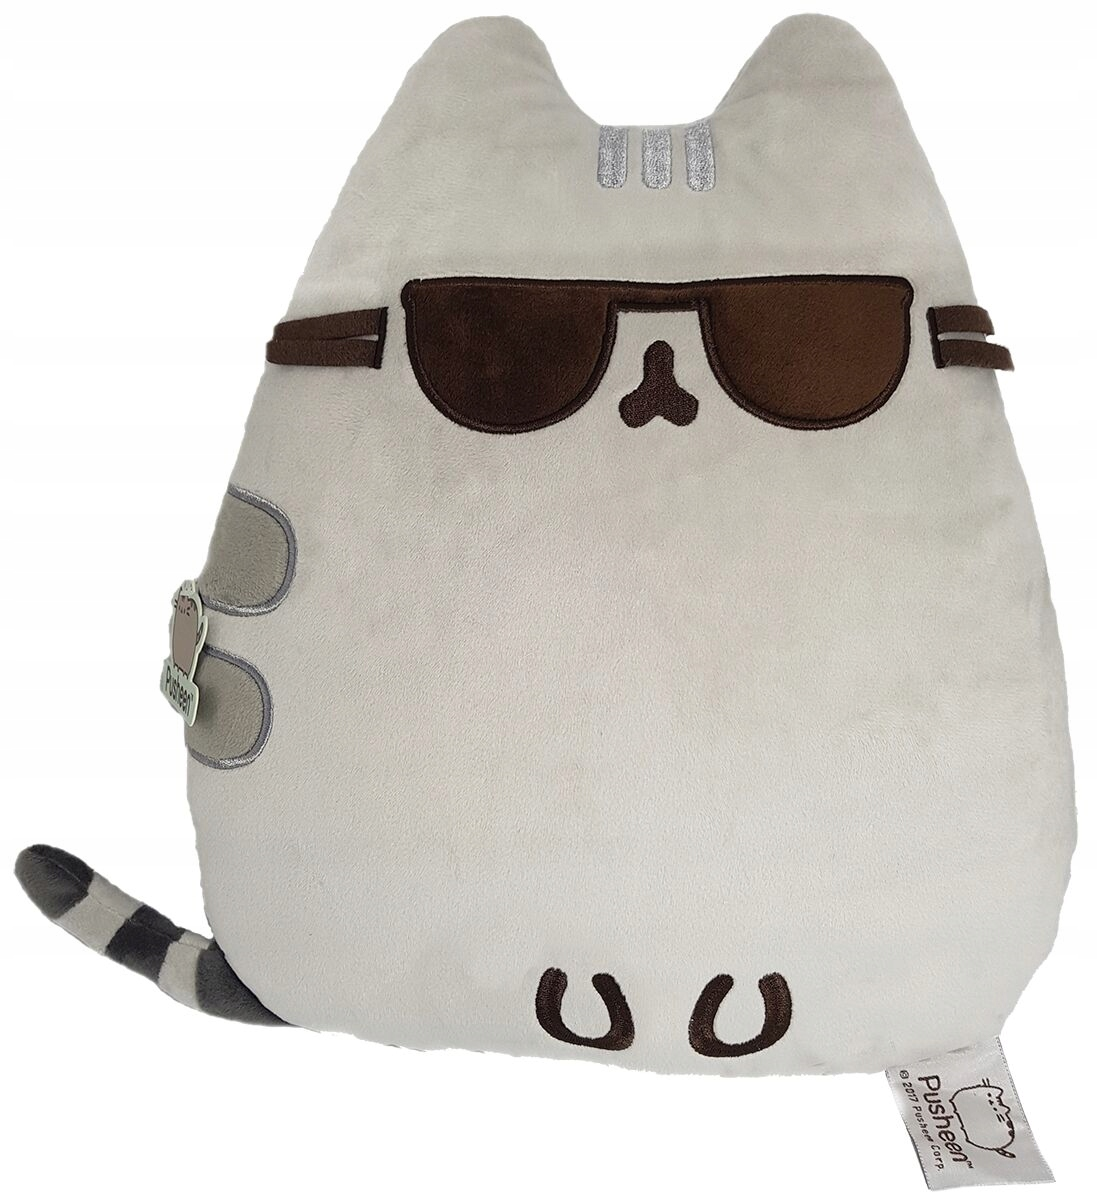 Mačka PUSHEEN JUMBO 102X85cm mäkká v okuliaroch